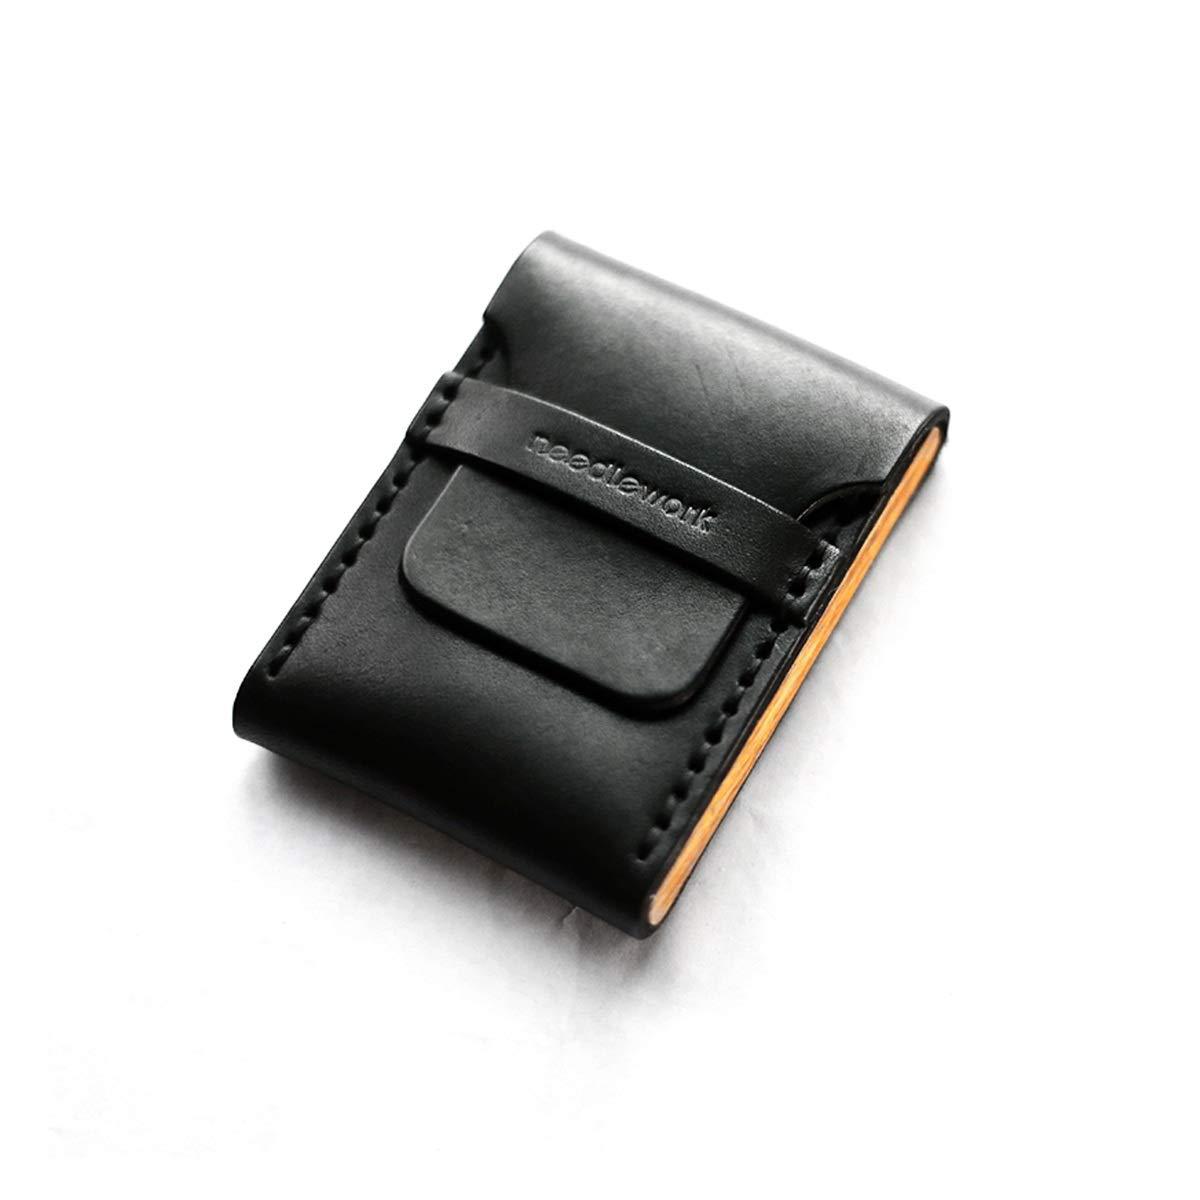 ZHONGYUE Cigarette Case, Portable Cigarette Case, Retro Leather Cigarette Case Unique Design, Sturdy and Lightweight. (Style : B)